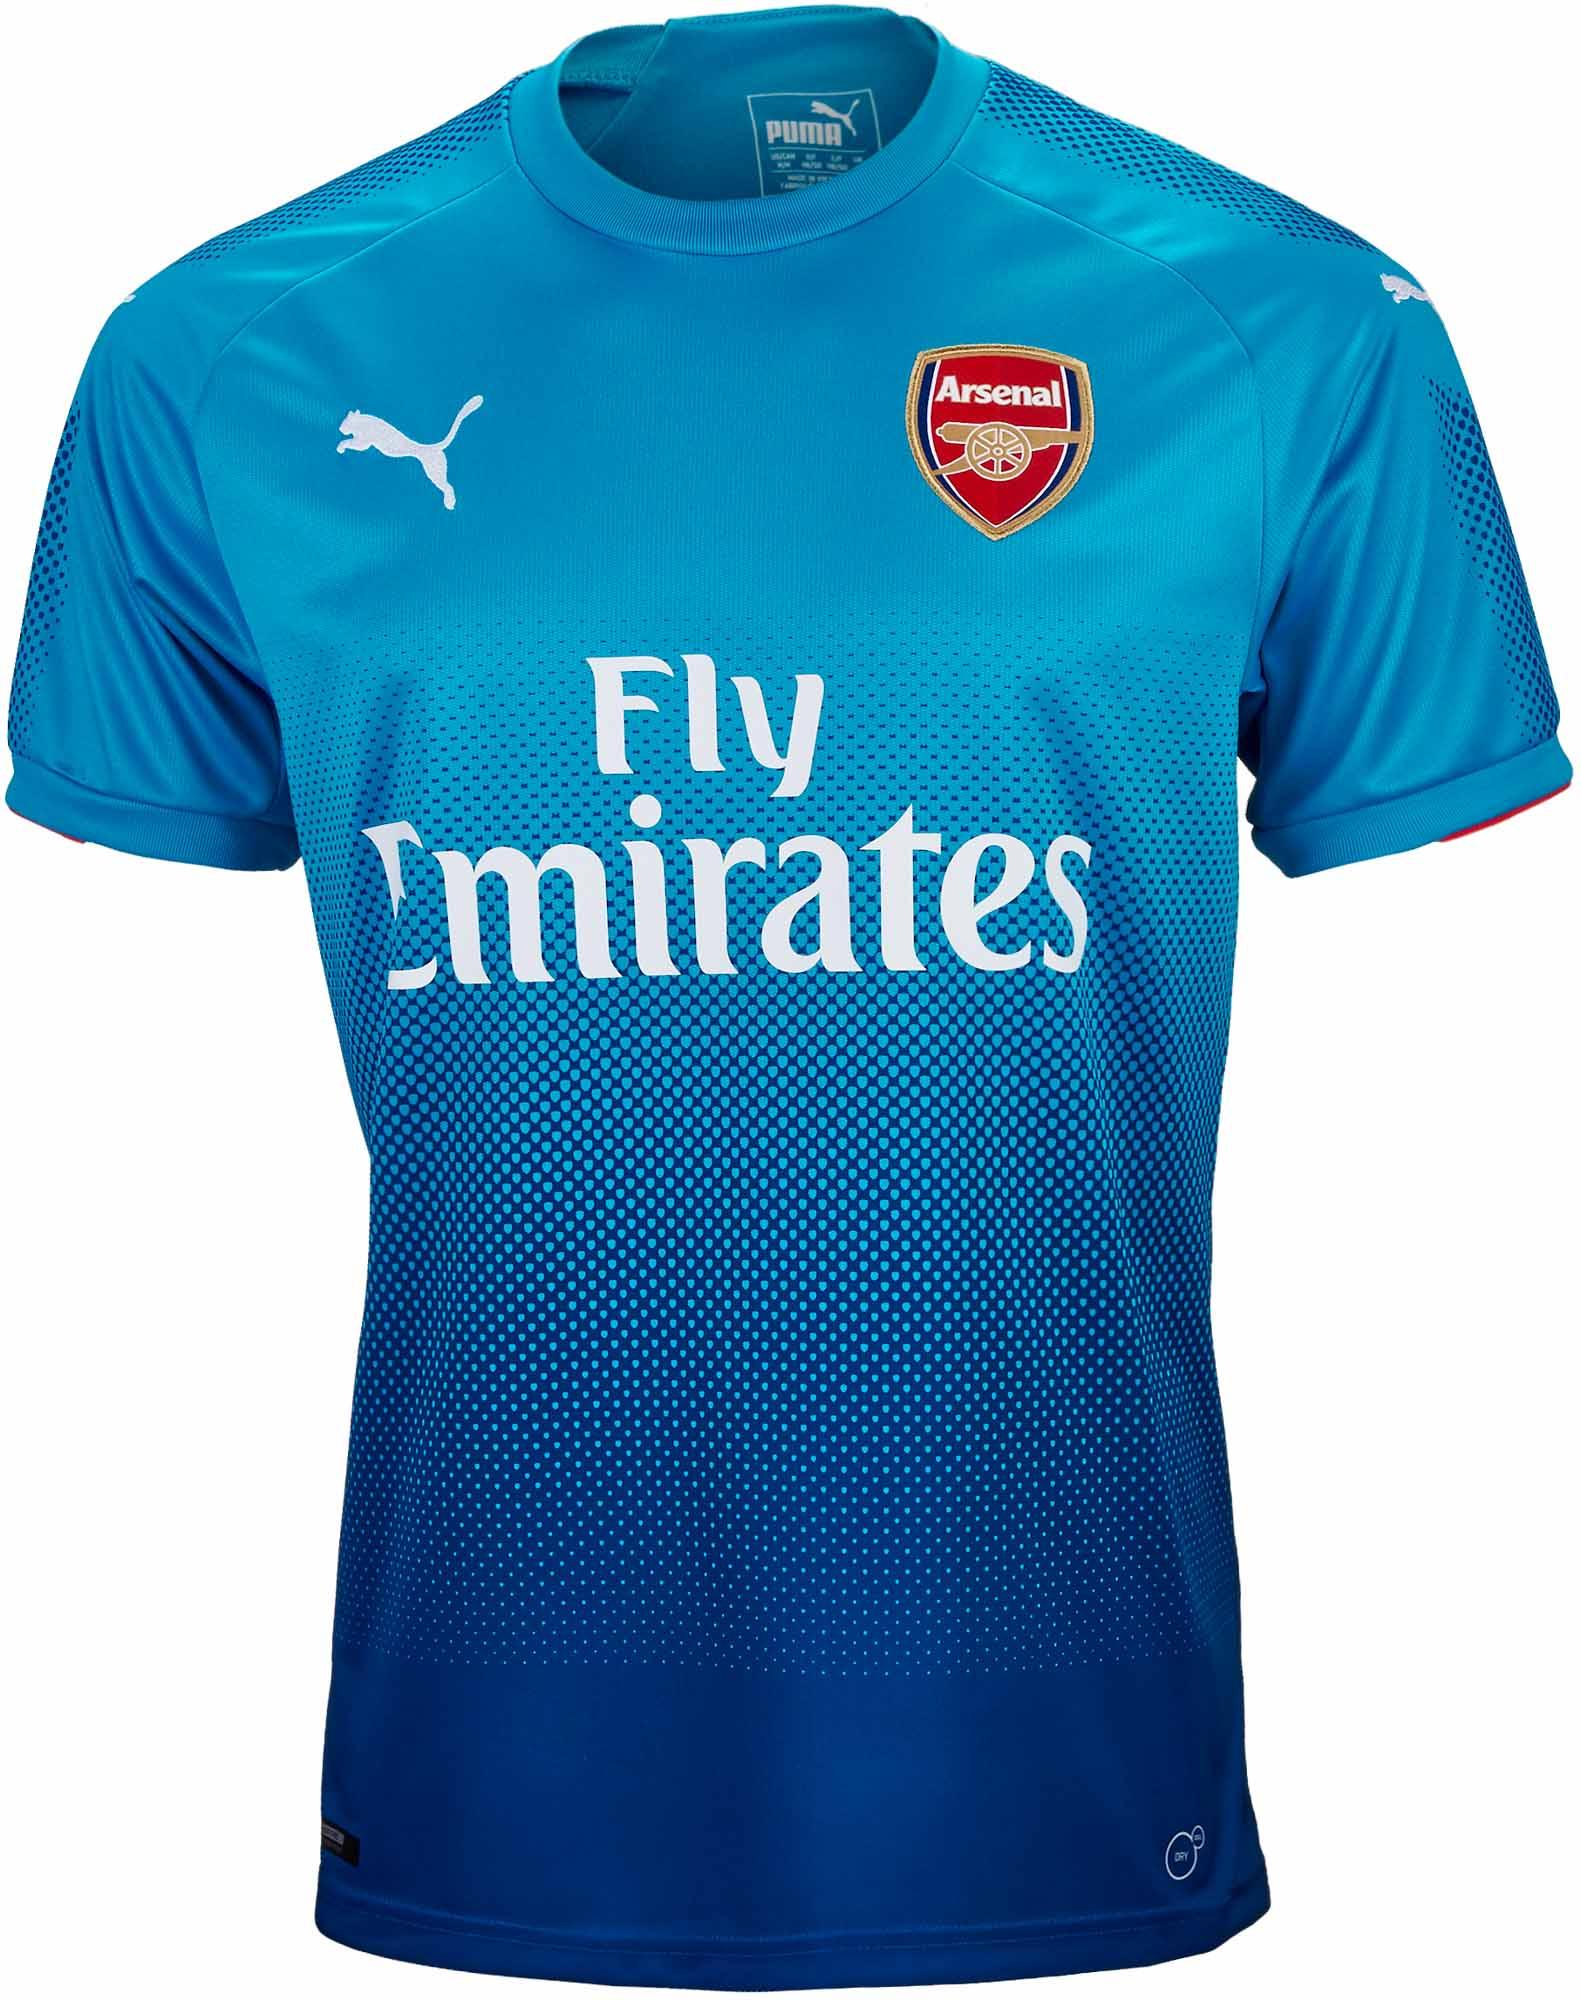 cbe3bff72 Puma Kids Arsenal Away Jersey 2017-18 - Soccer Master